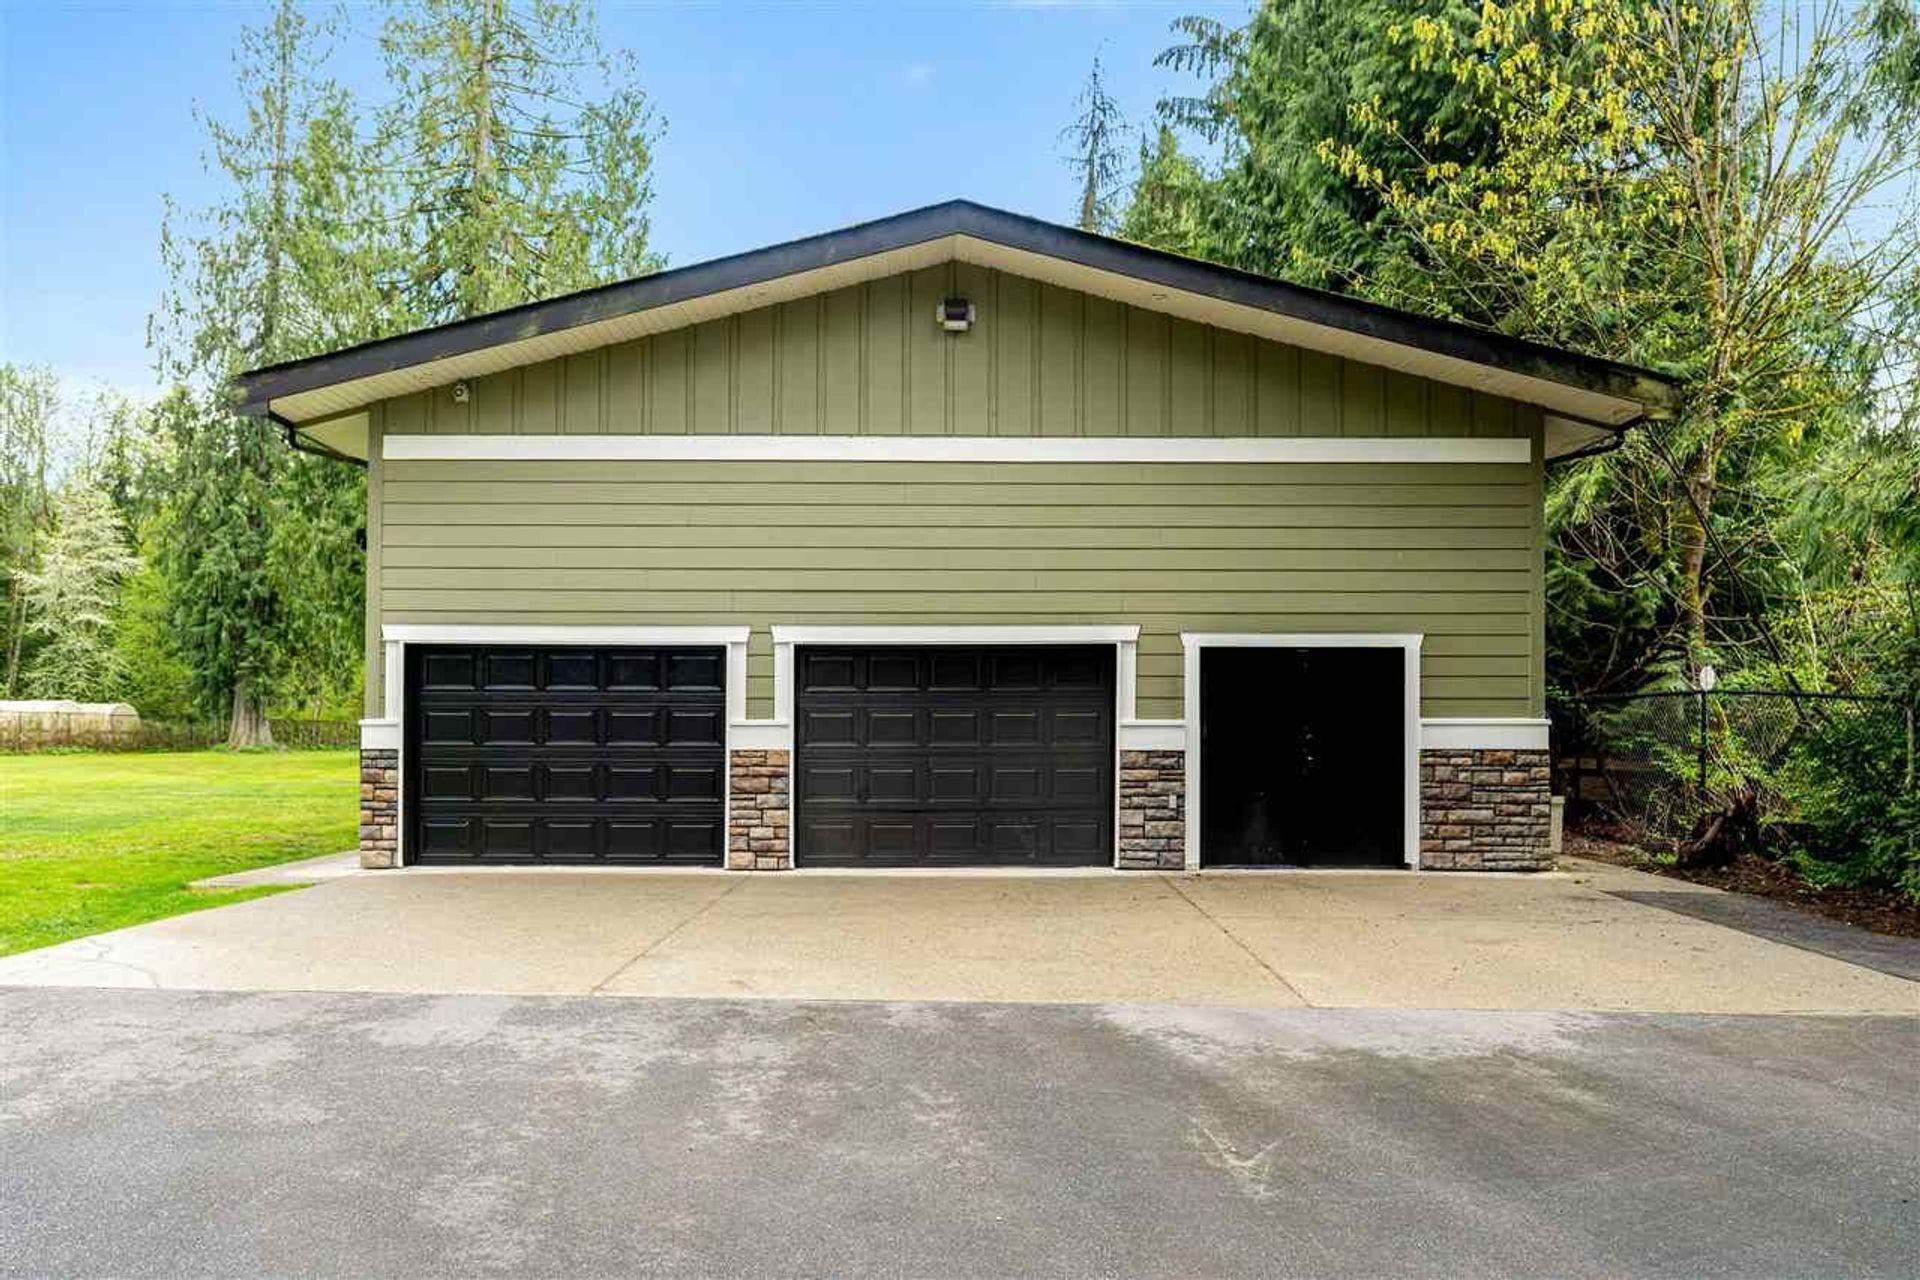 24852-ferguson-avenue-cottonwood-mr-maple-ridge-38 of 24852 Ferguson Avenue, Cottonwood MR, Maple Ridge